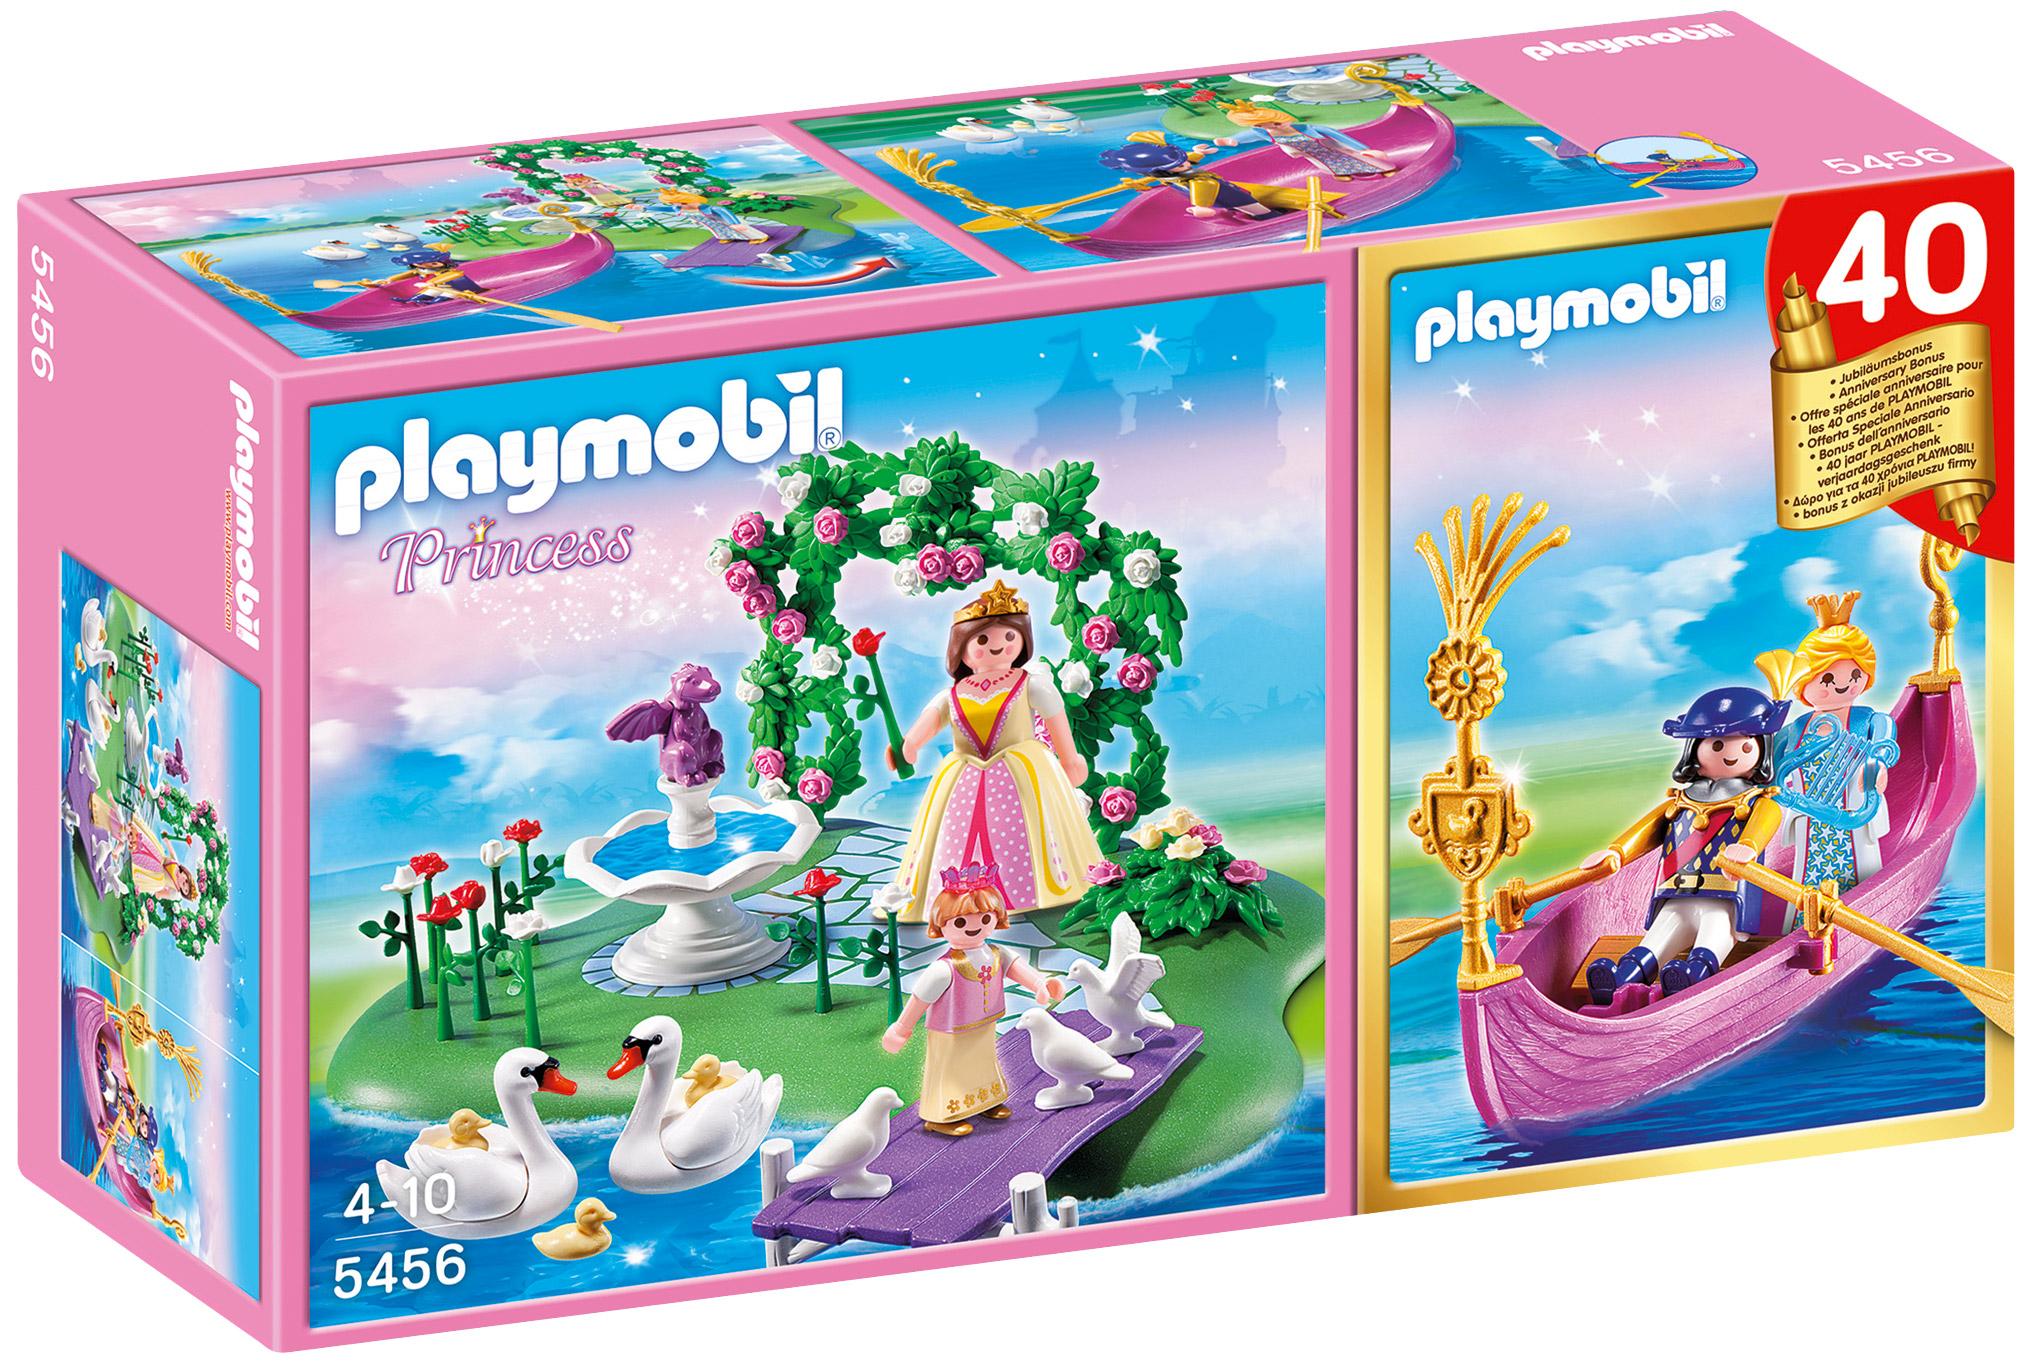 PLAYMOBIL Princess 5456 Pas Cher